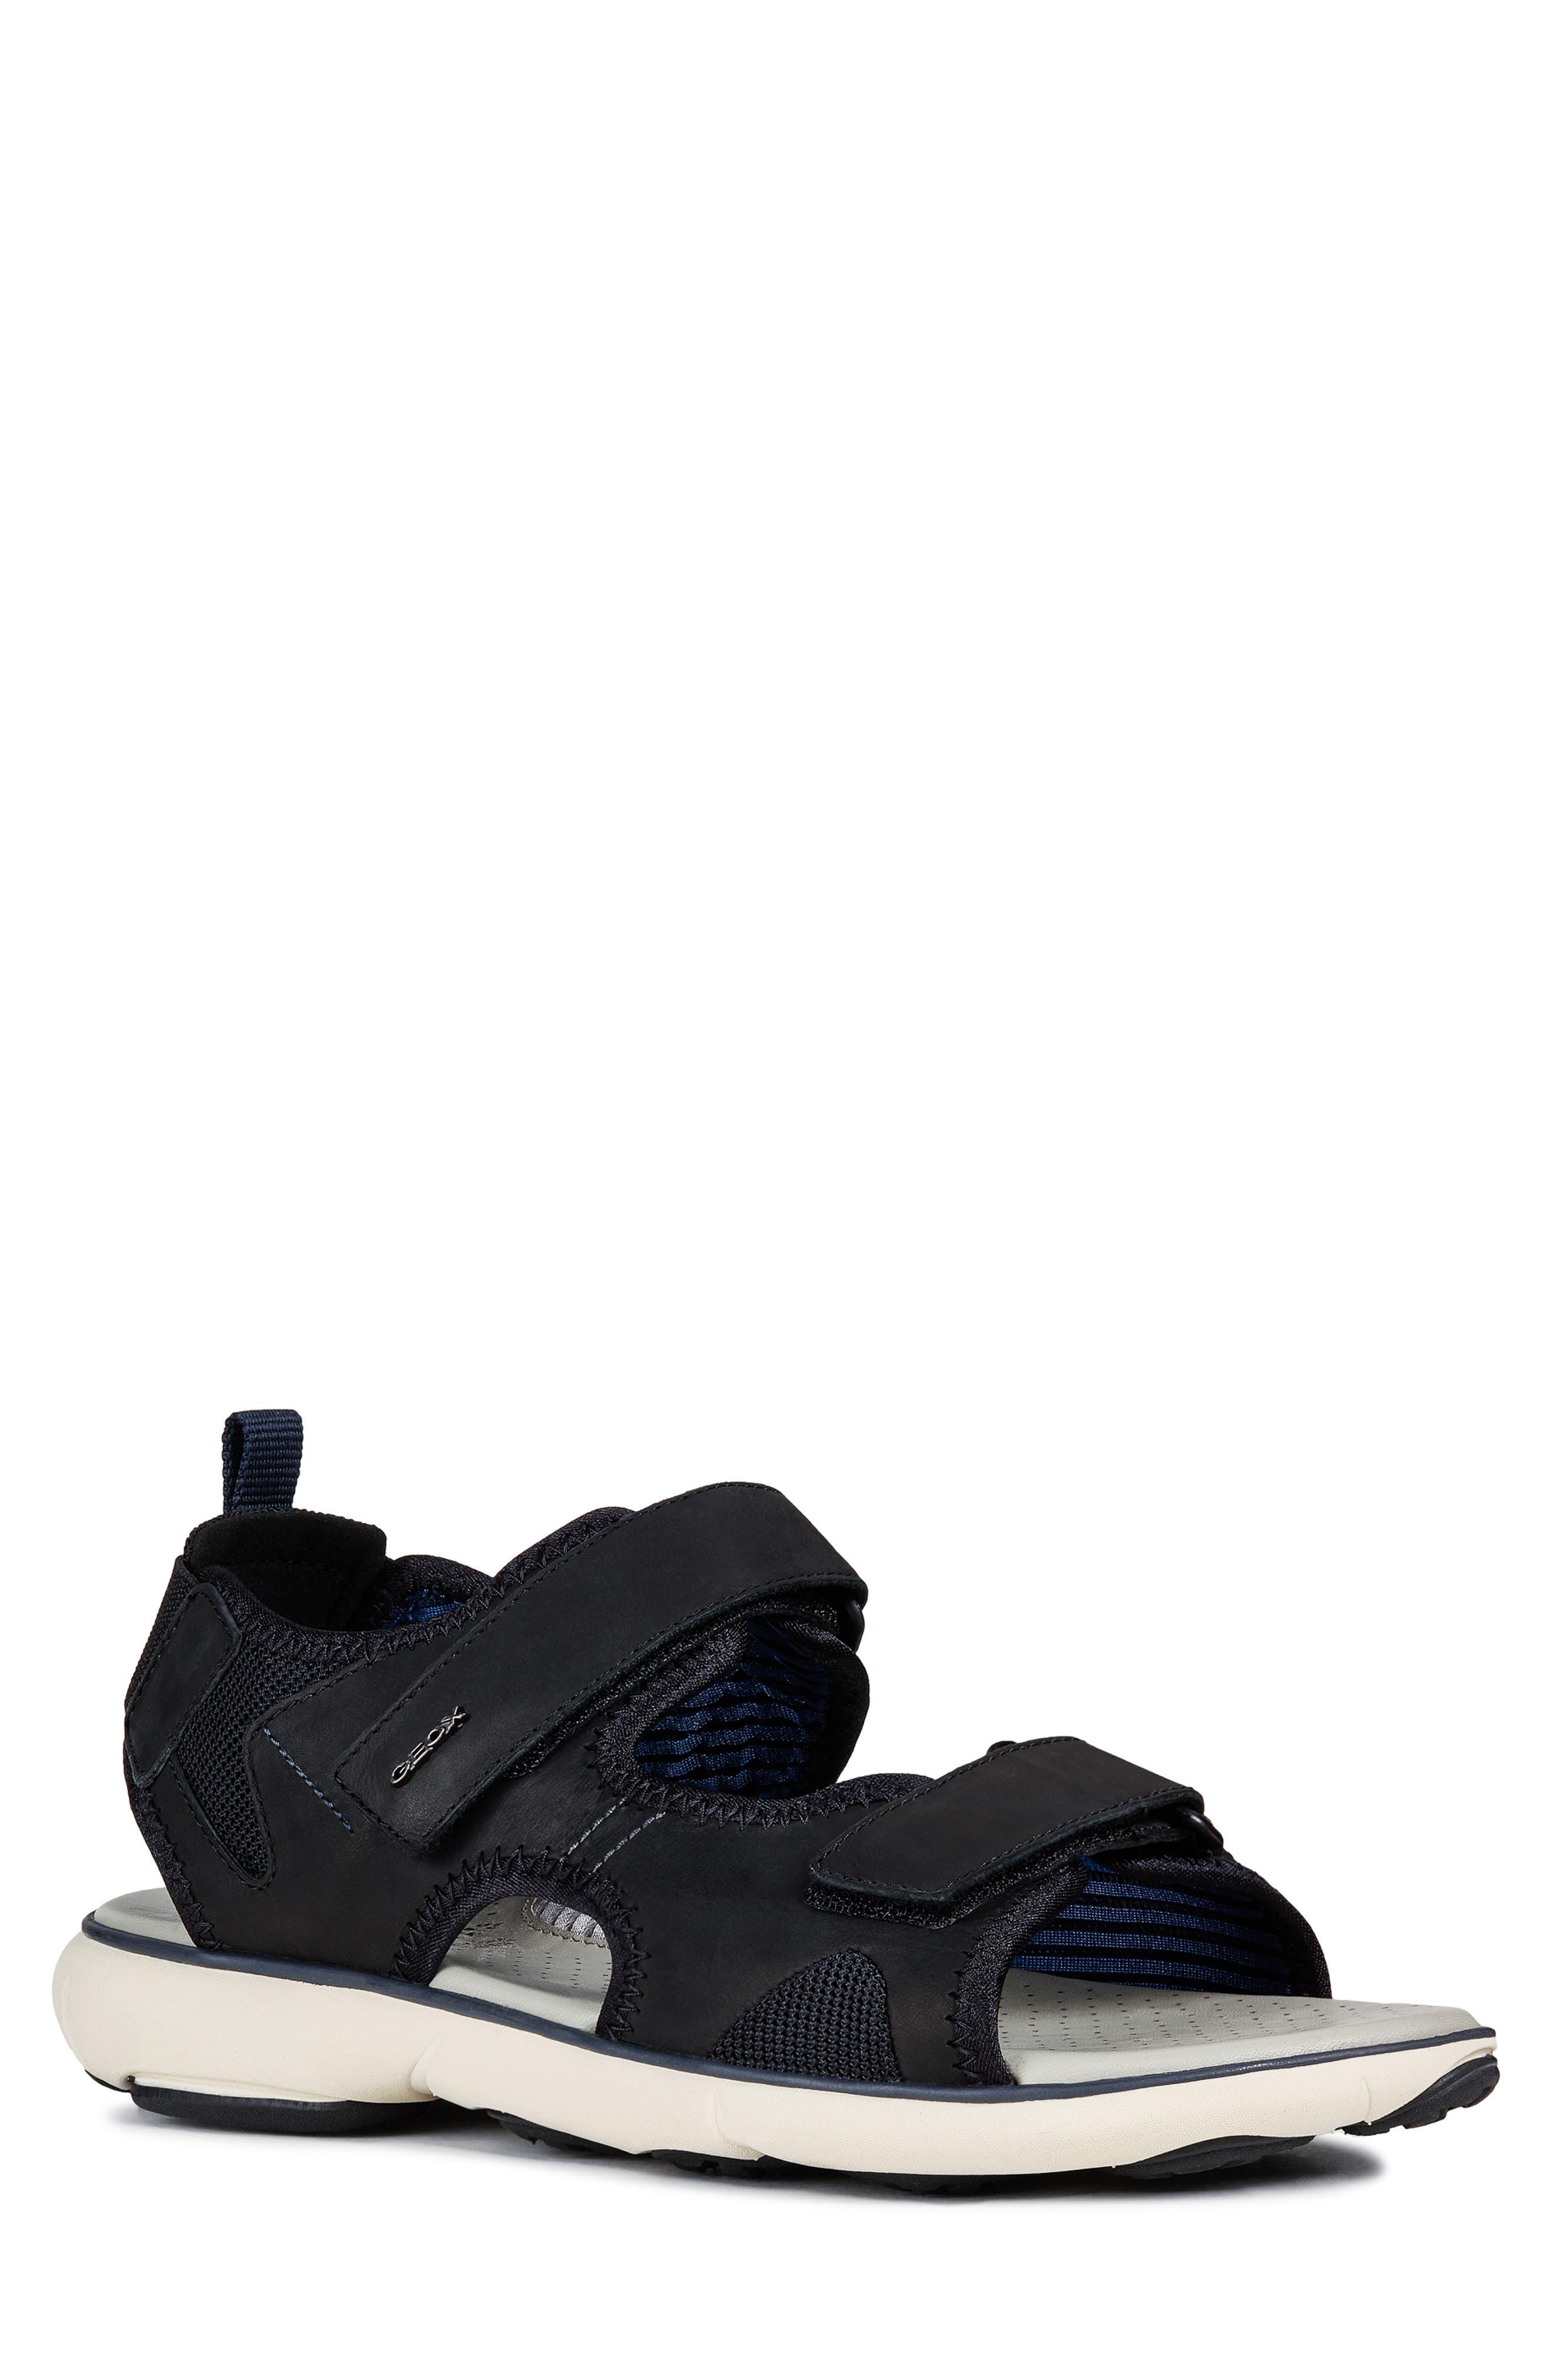 Geox Nebula L2 Sandal, Black